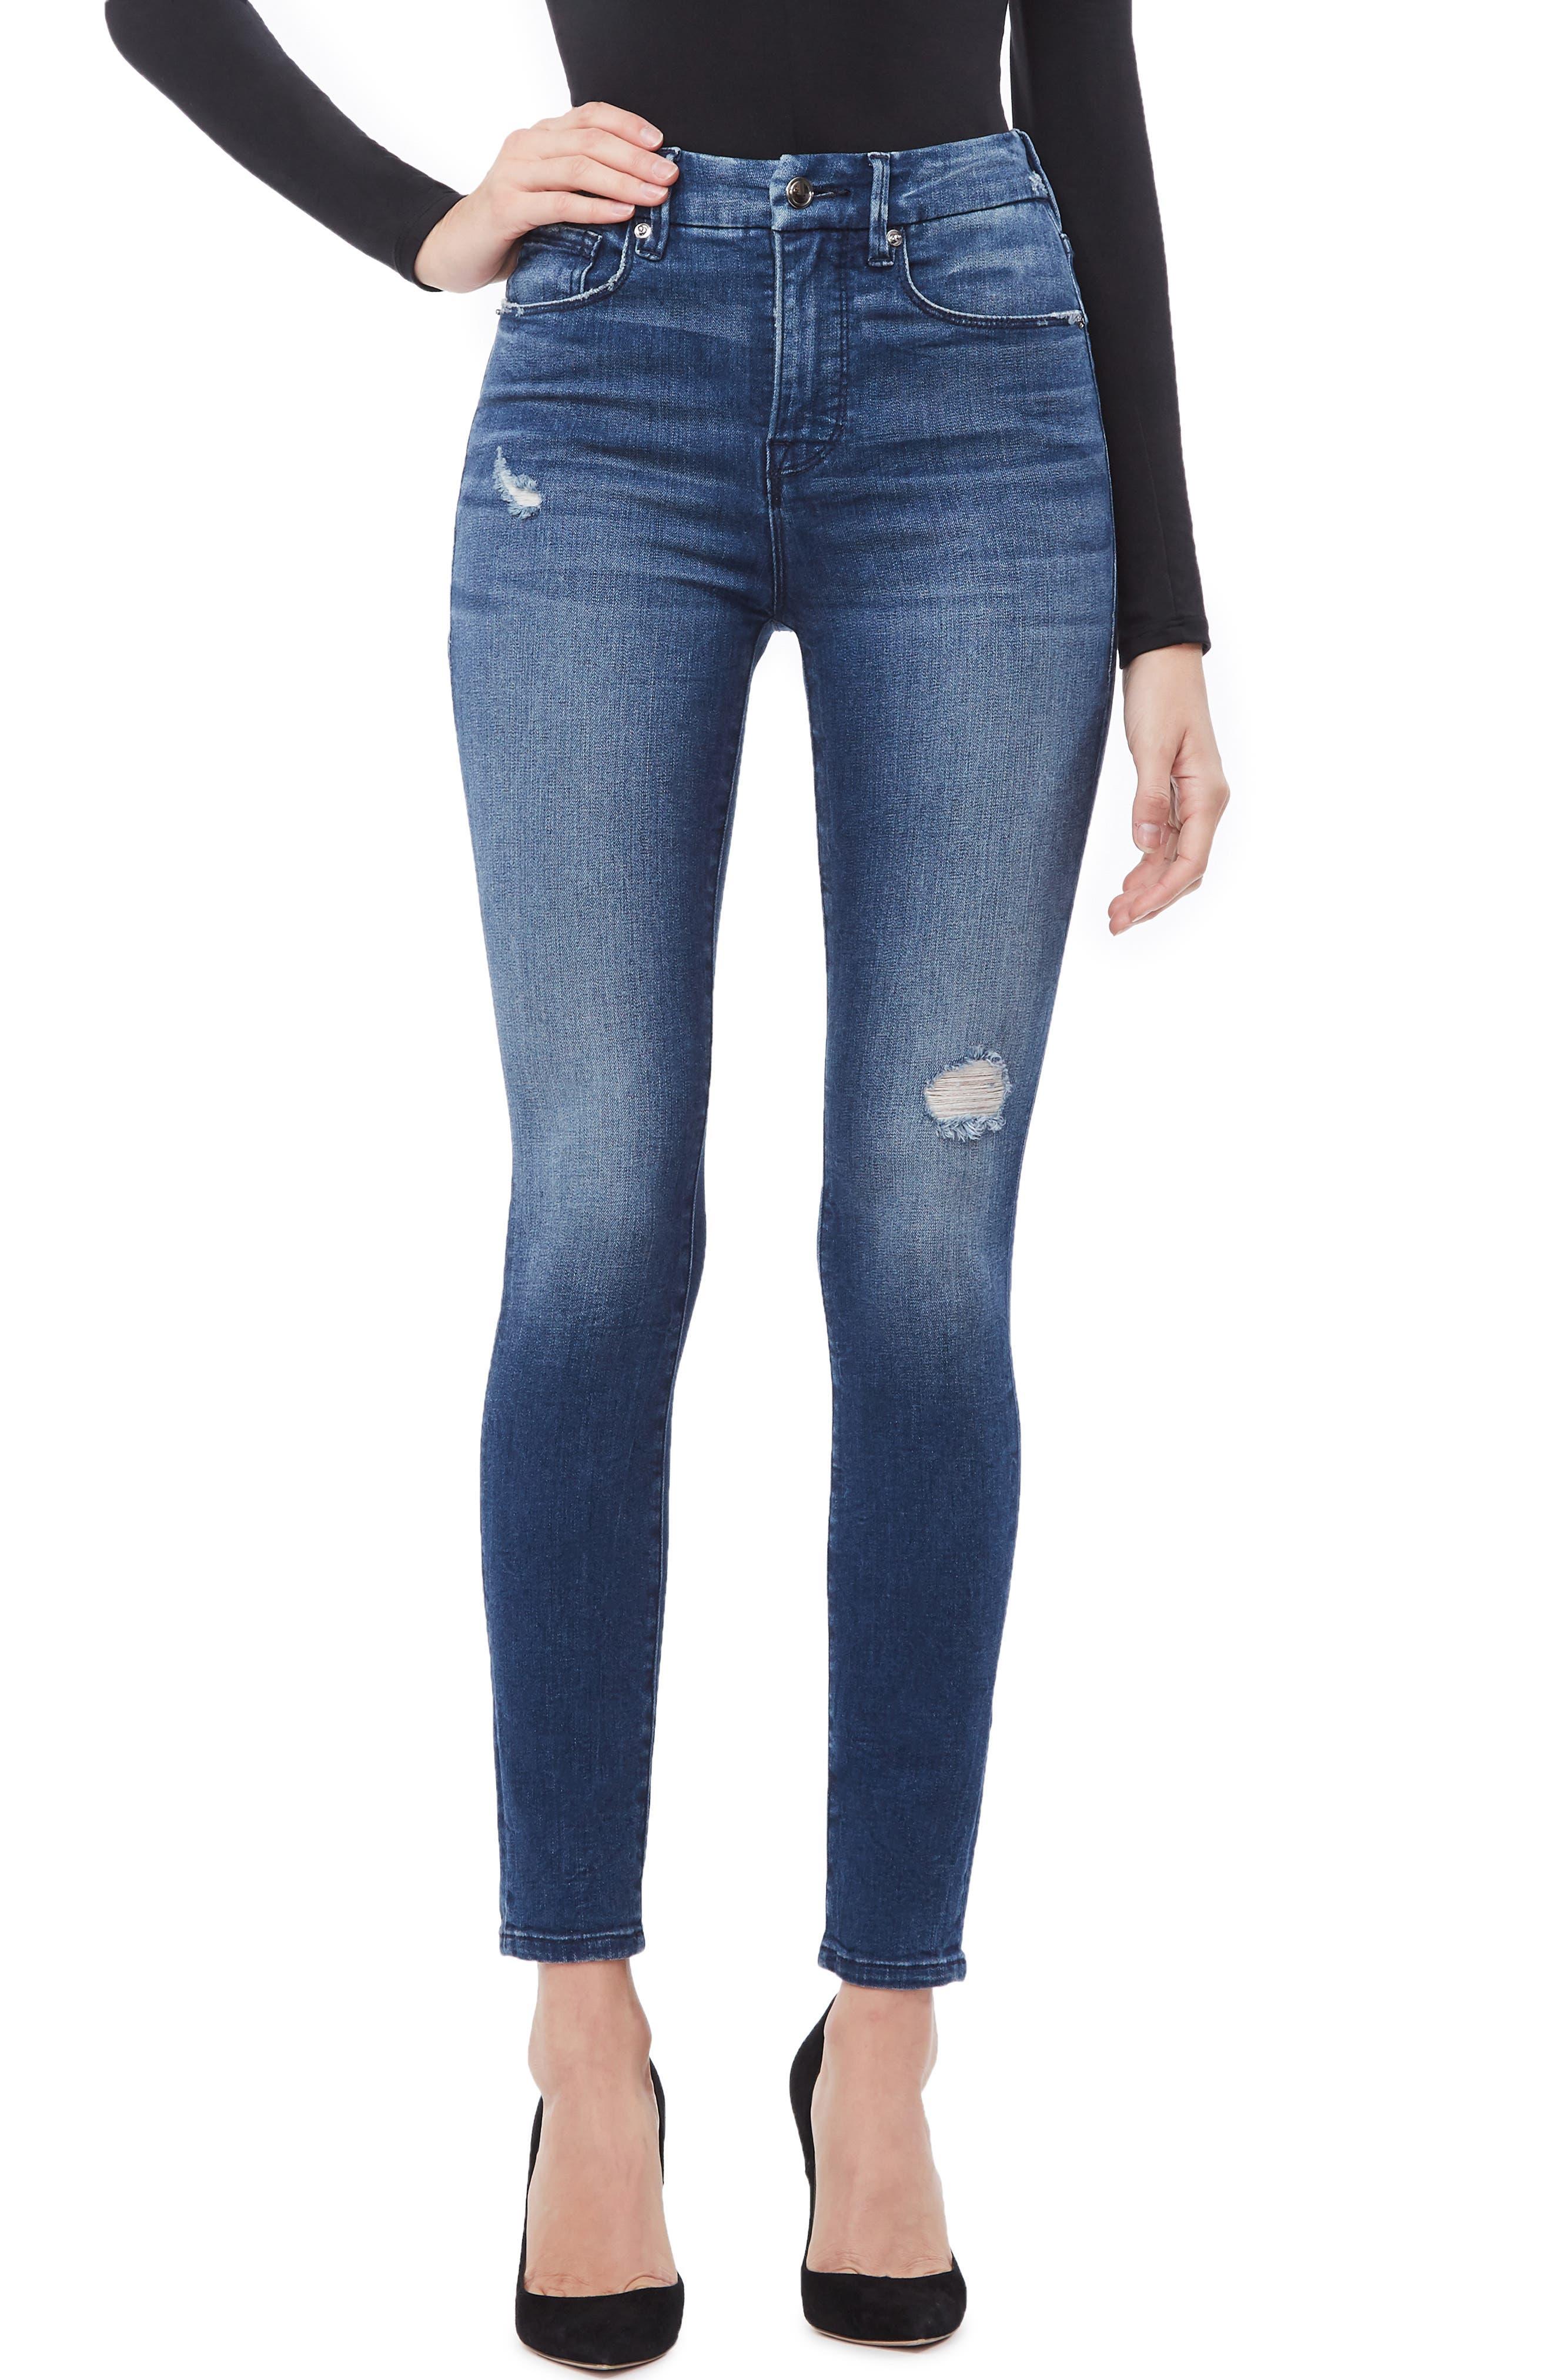 GOOD AMERICAN, Good Waist High Waist Skinny Jeans, Main thumbnail 1, color, BLUE249